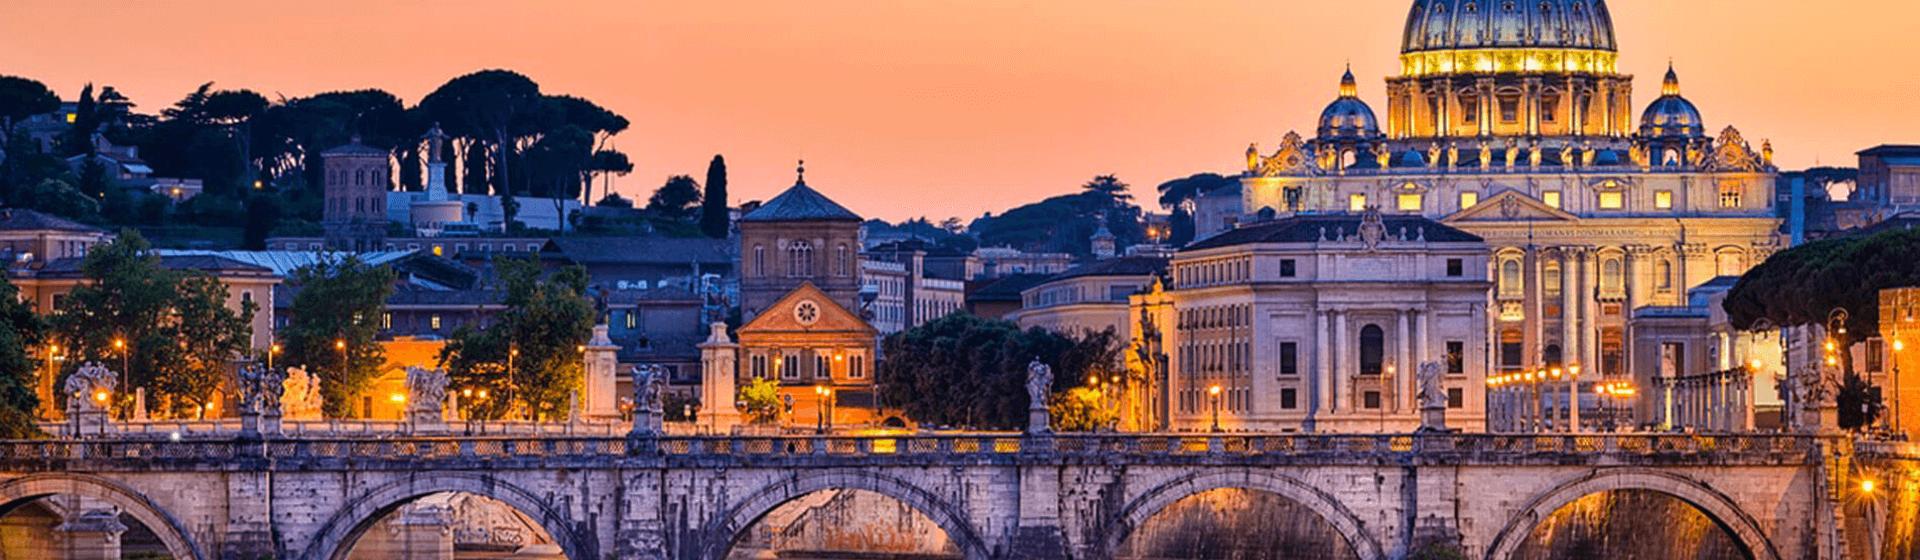 Filippo Loreti - Rome series